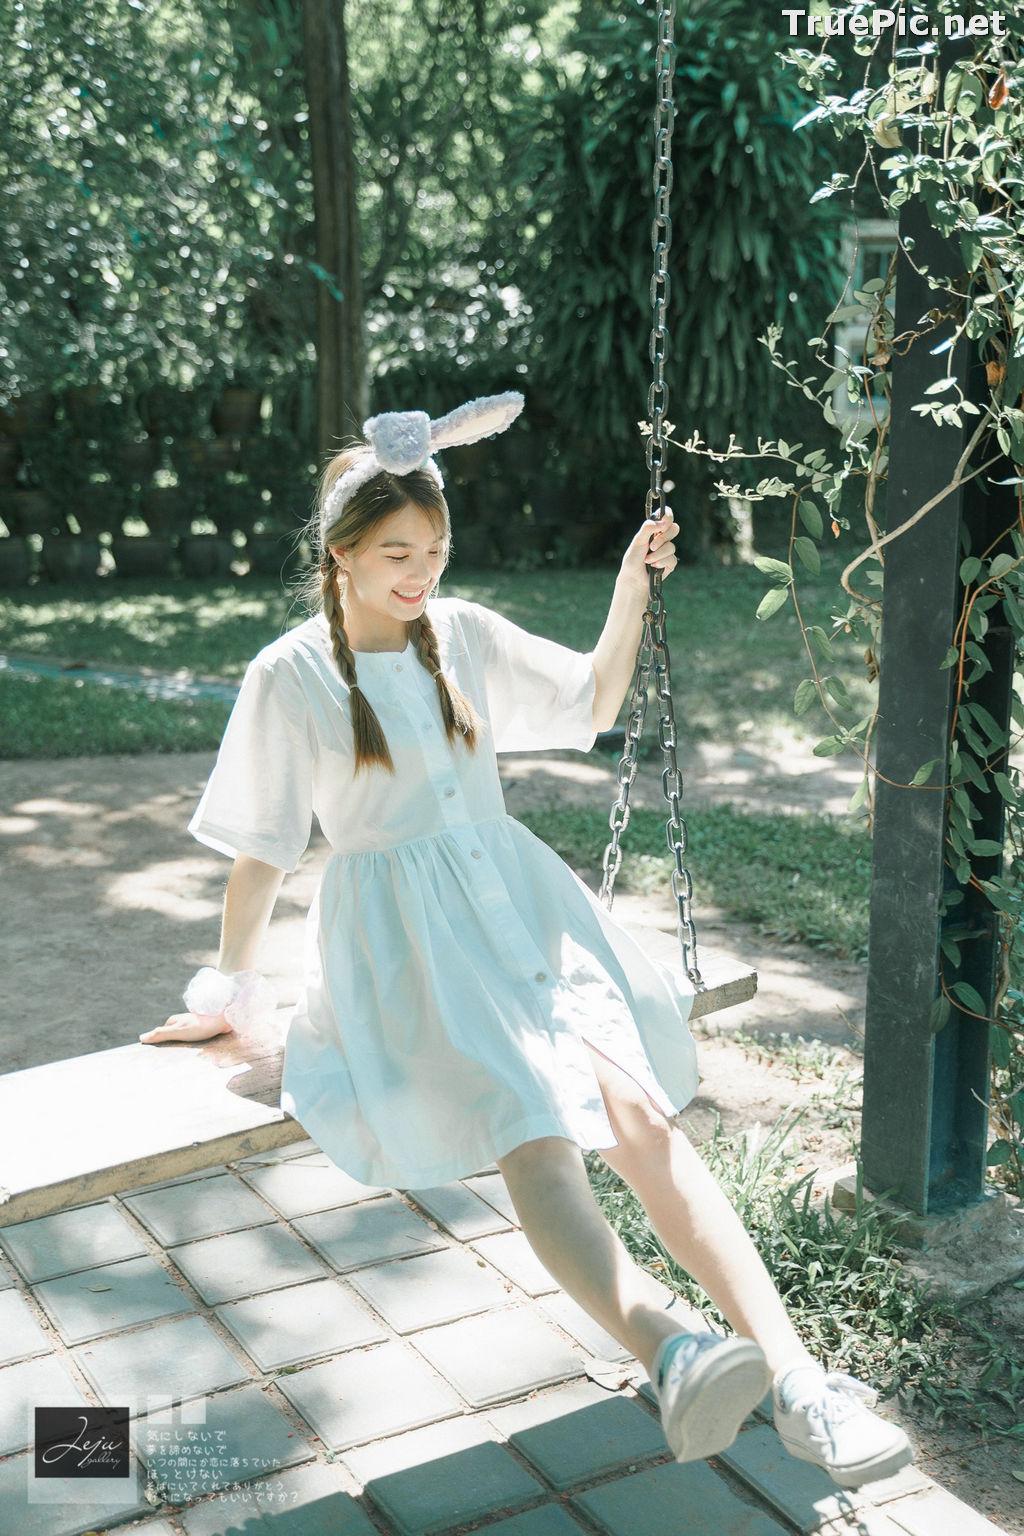 Image Thailand Cute Model - Napat Cdhg - Gam Bunny Girl - TruePic.net - Picture-9